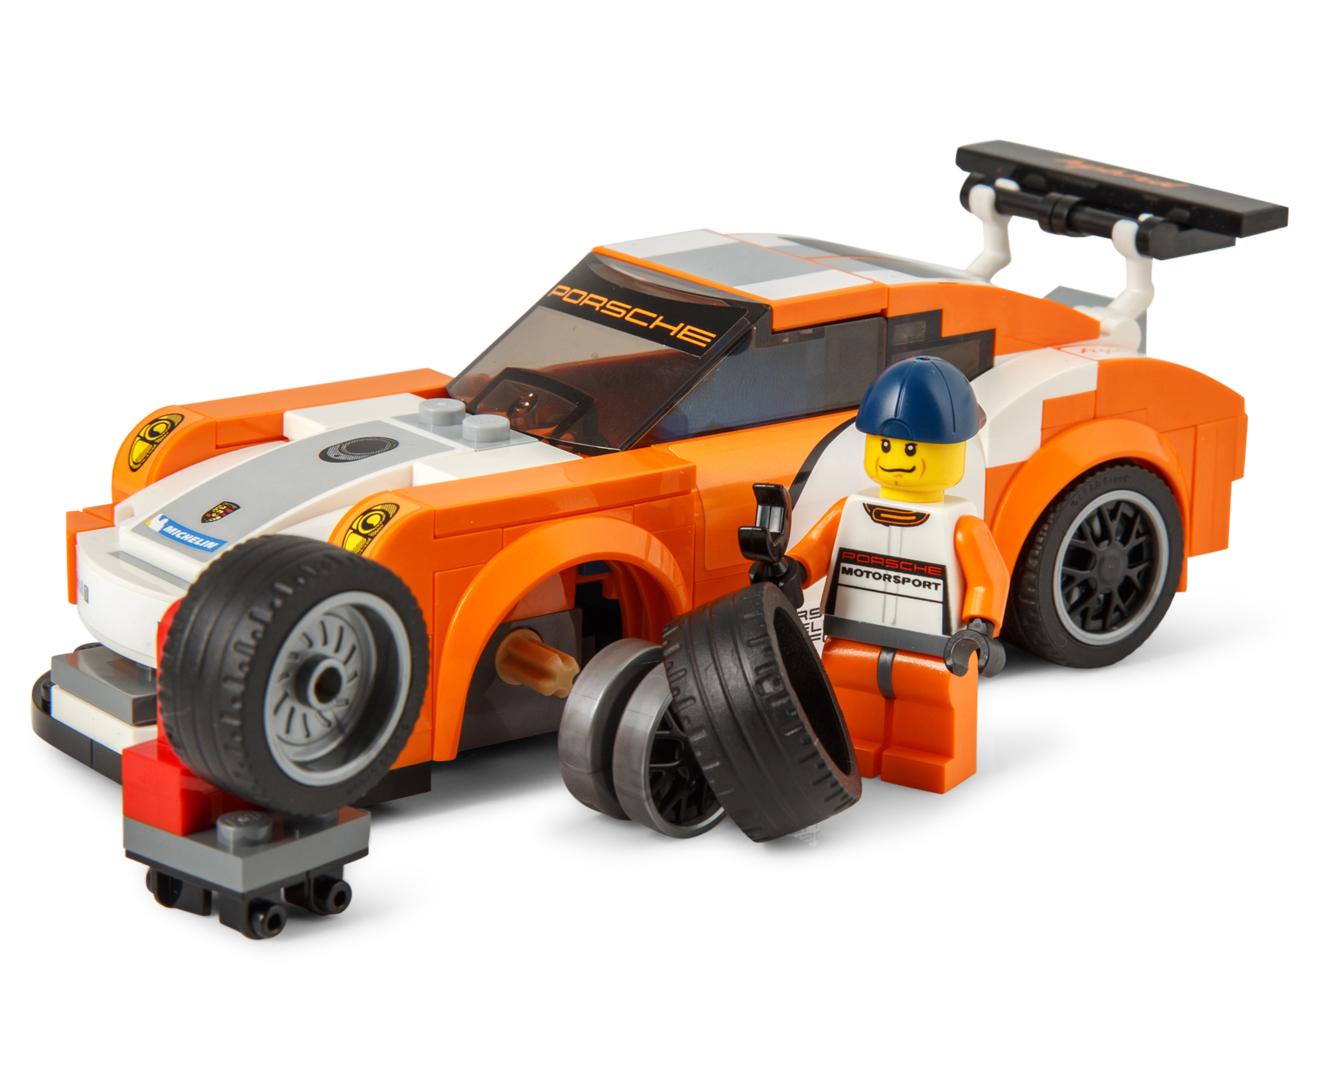 lego speed champions porsche 911 gt finish line building set. Black Bedroom Furniture Sets. Home Design Ideas